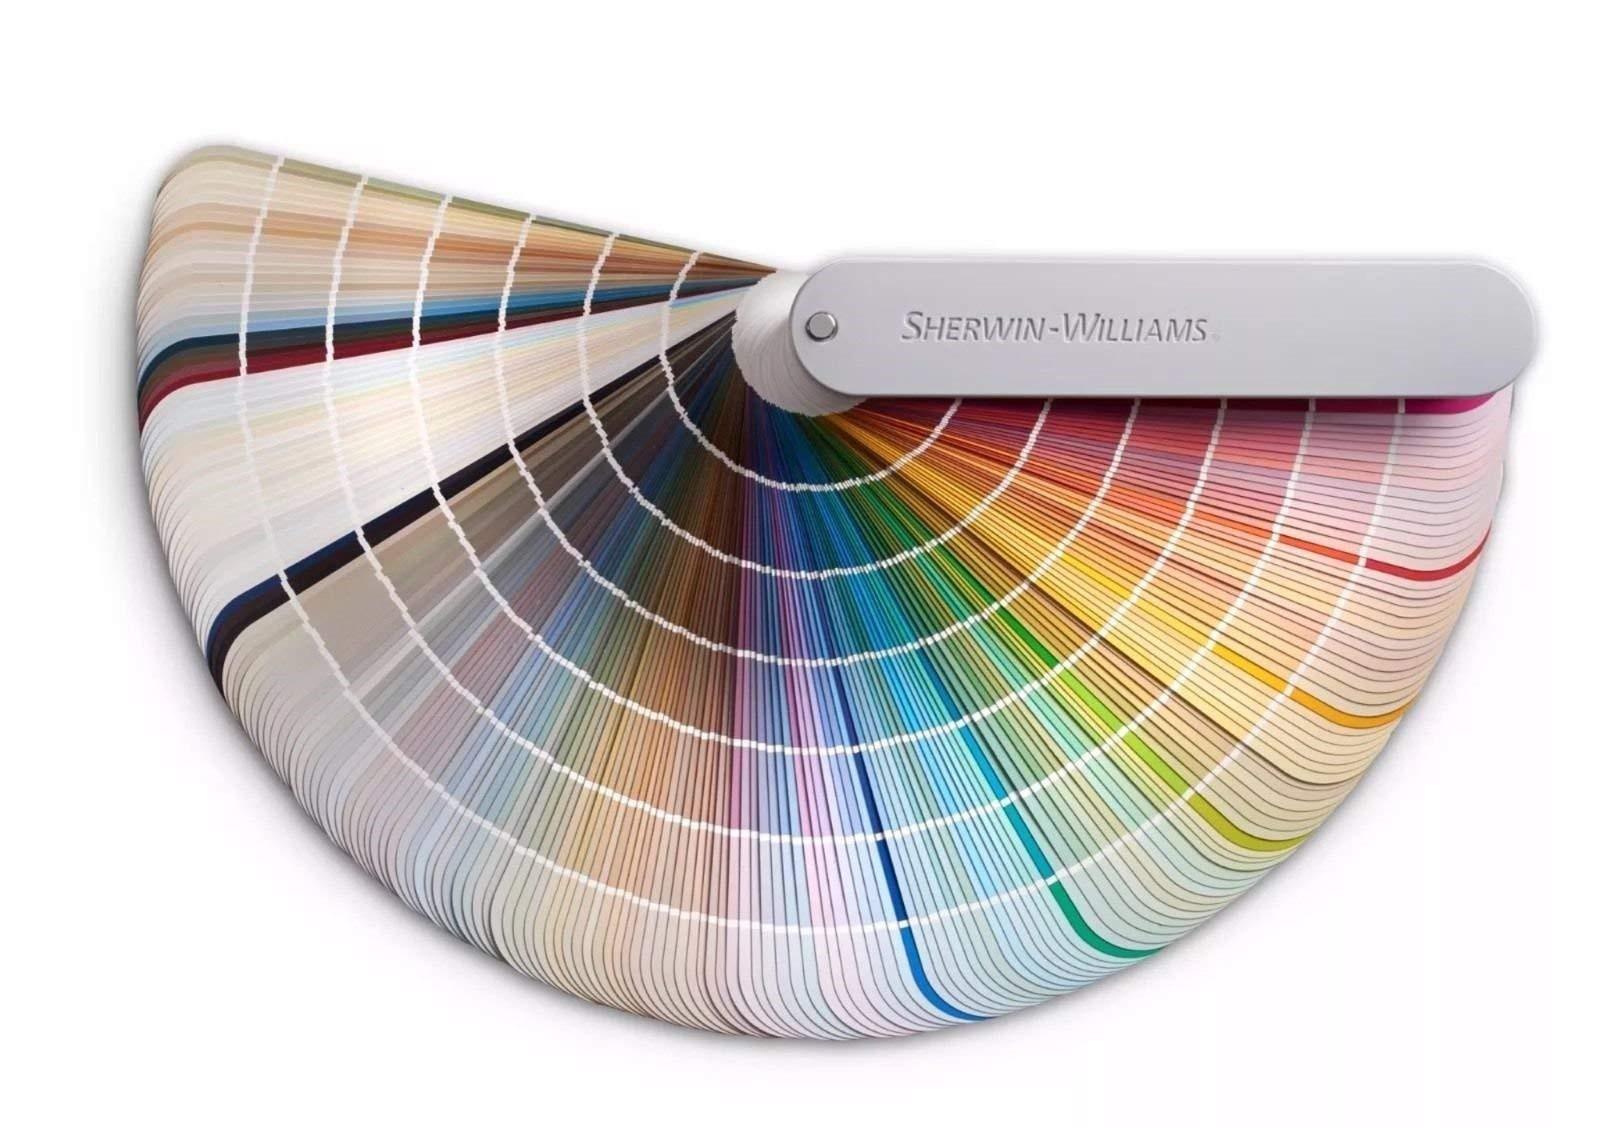 Sherwin Williams Deck Paint Reviews  Sherwin Williams Colors collection Deck plete Paint